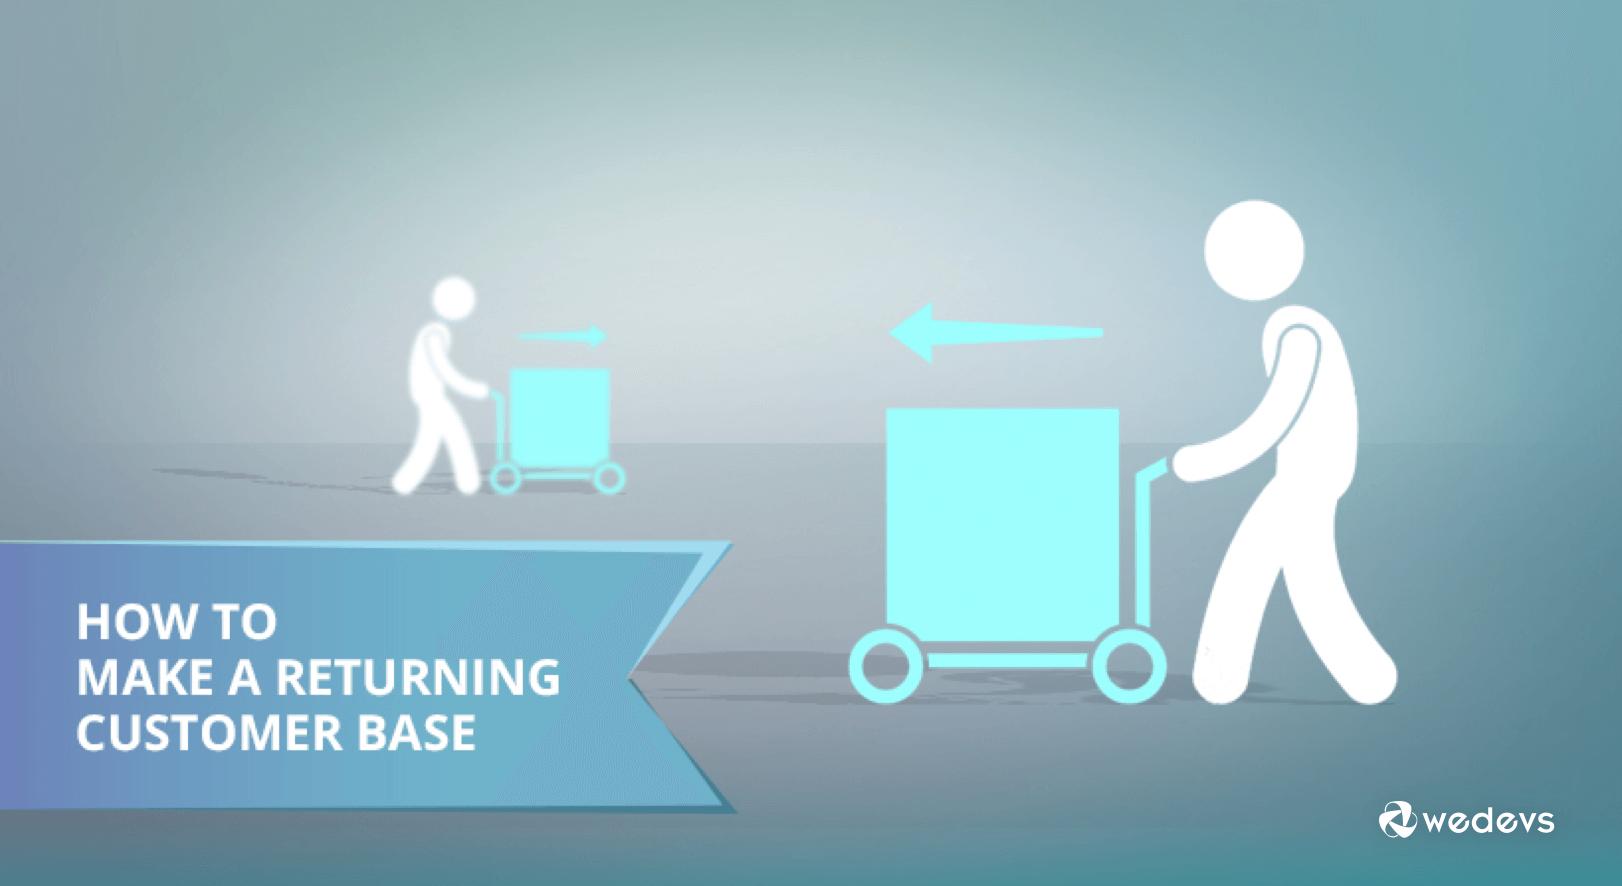 How to Make a Returning Customer Base